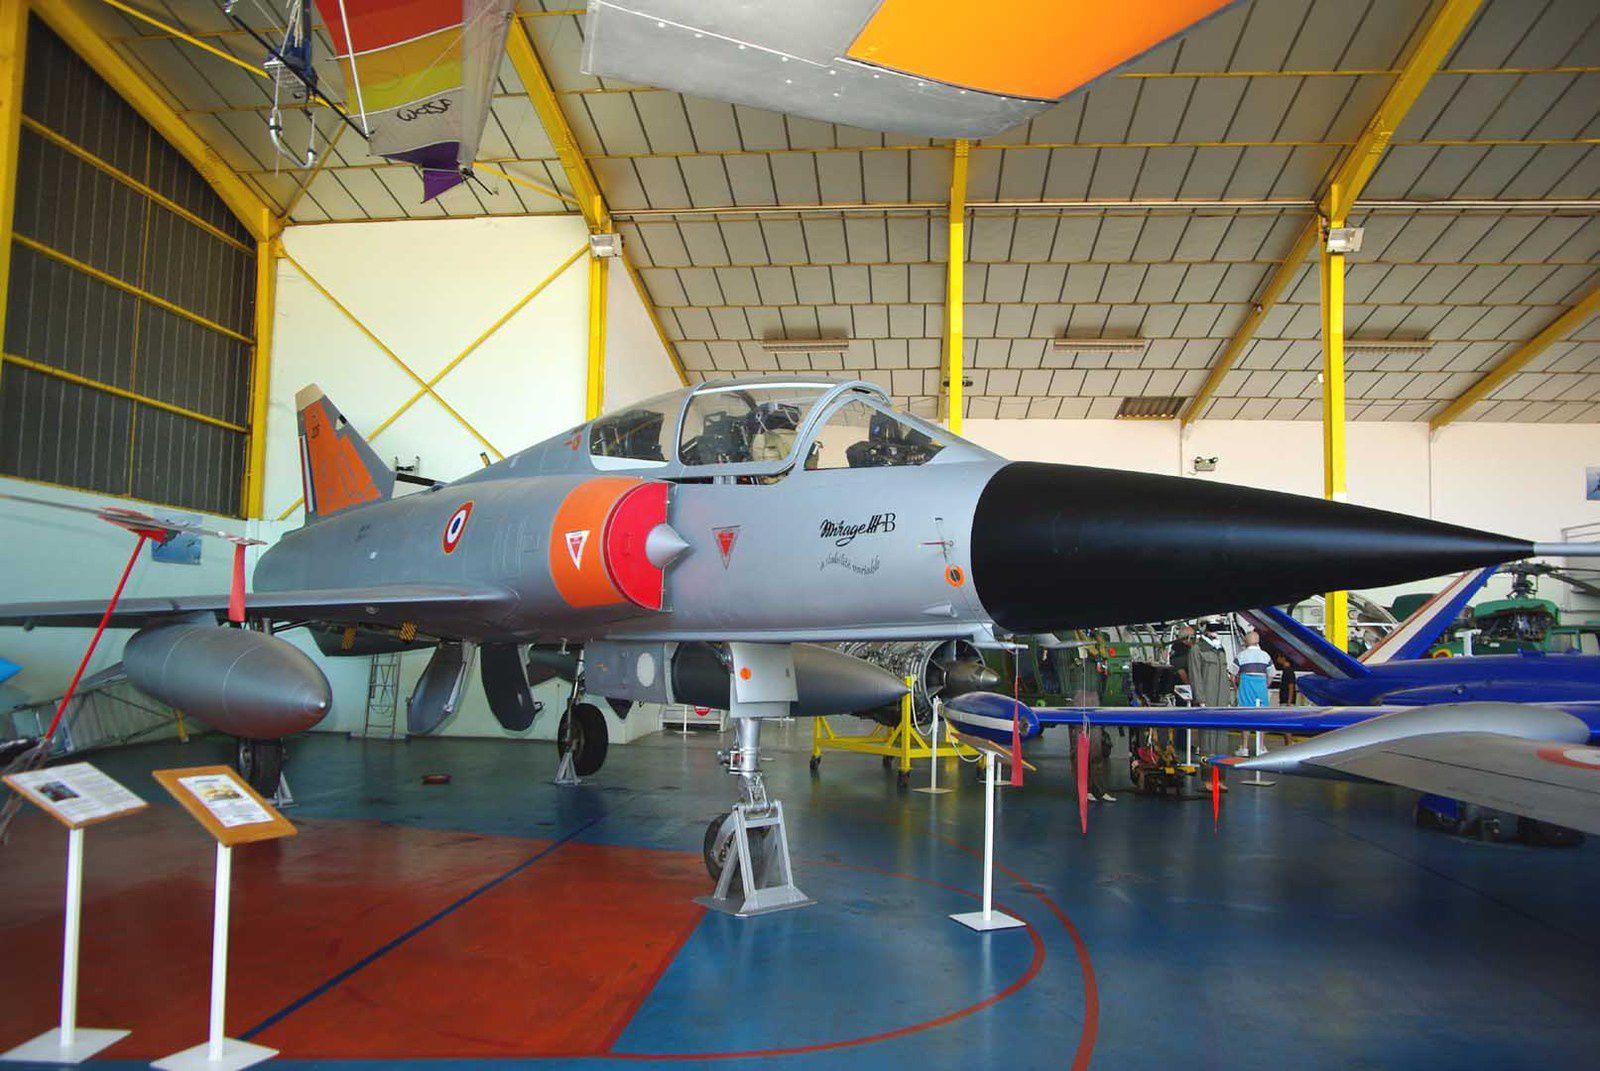 Le Dassault Mirage IIIB N°225.